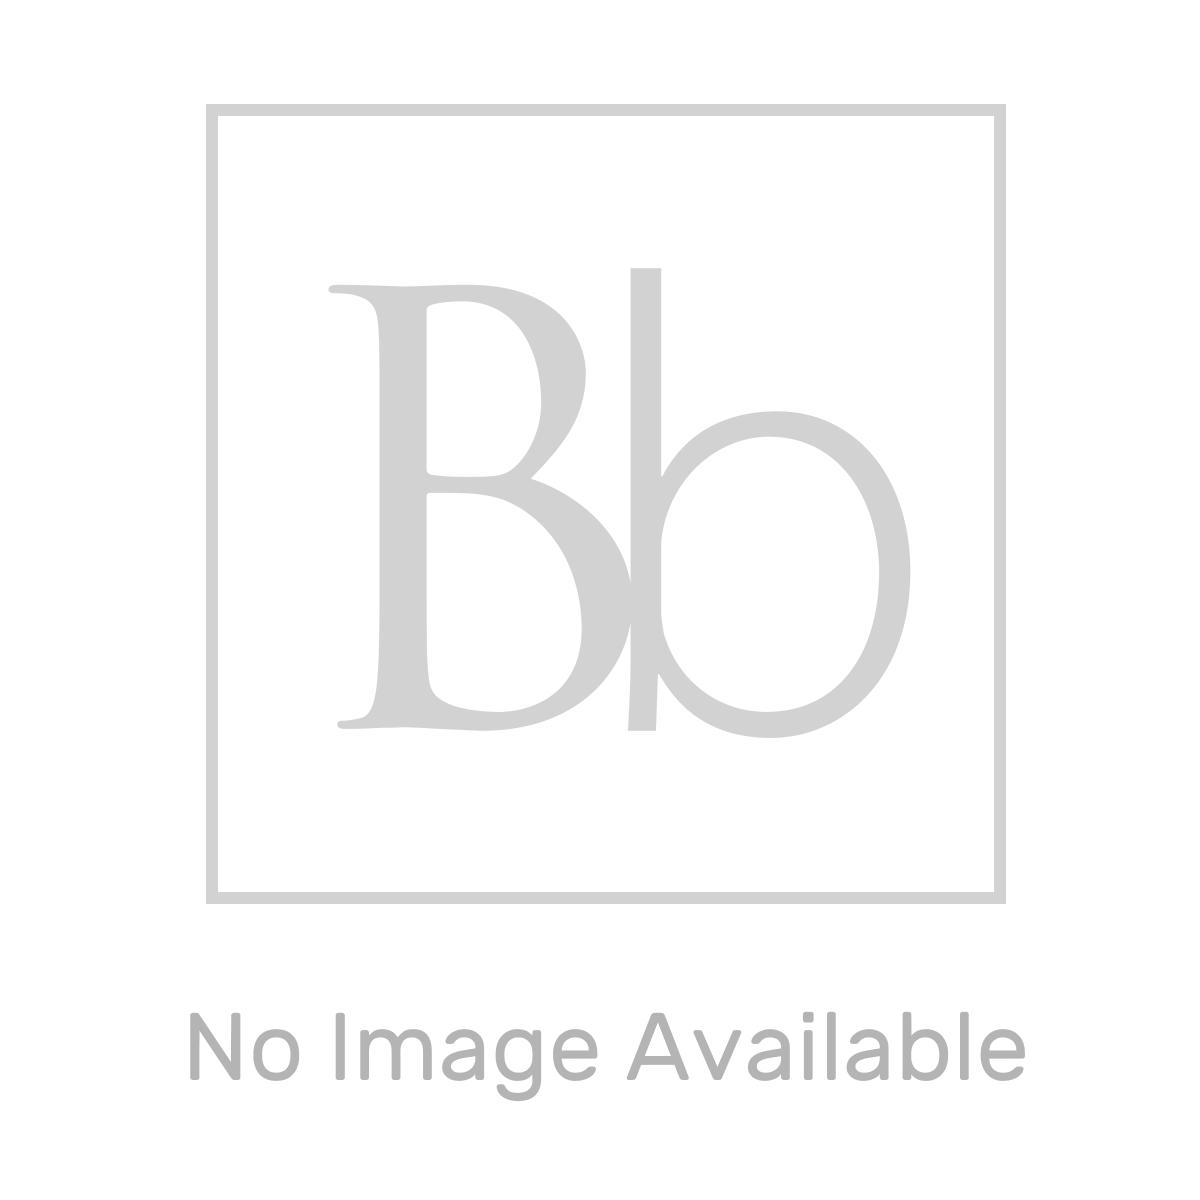 Moods Solarna Shower Bath Front Panel